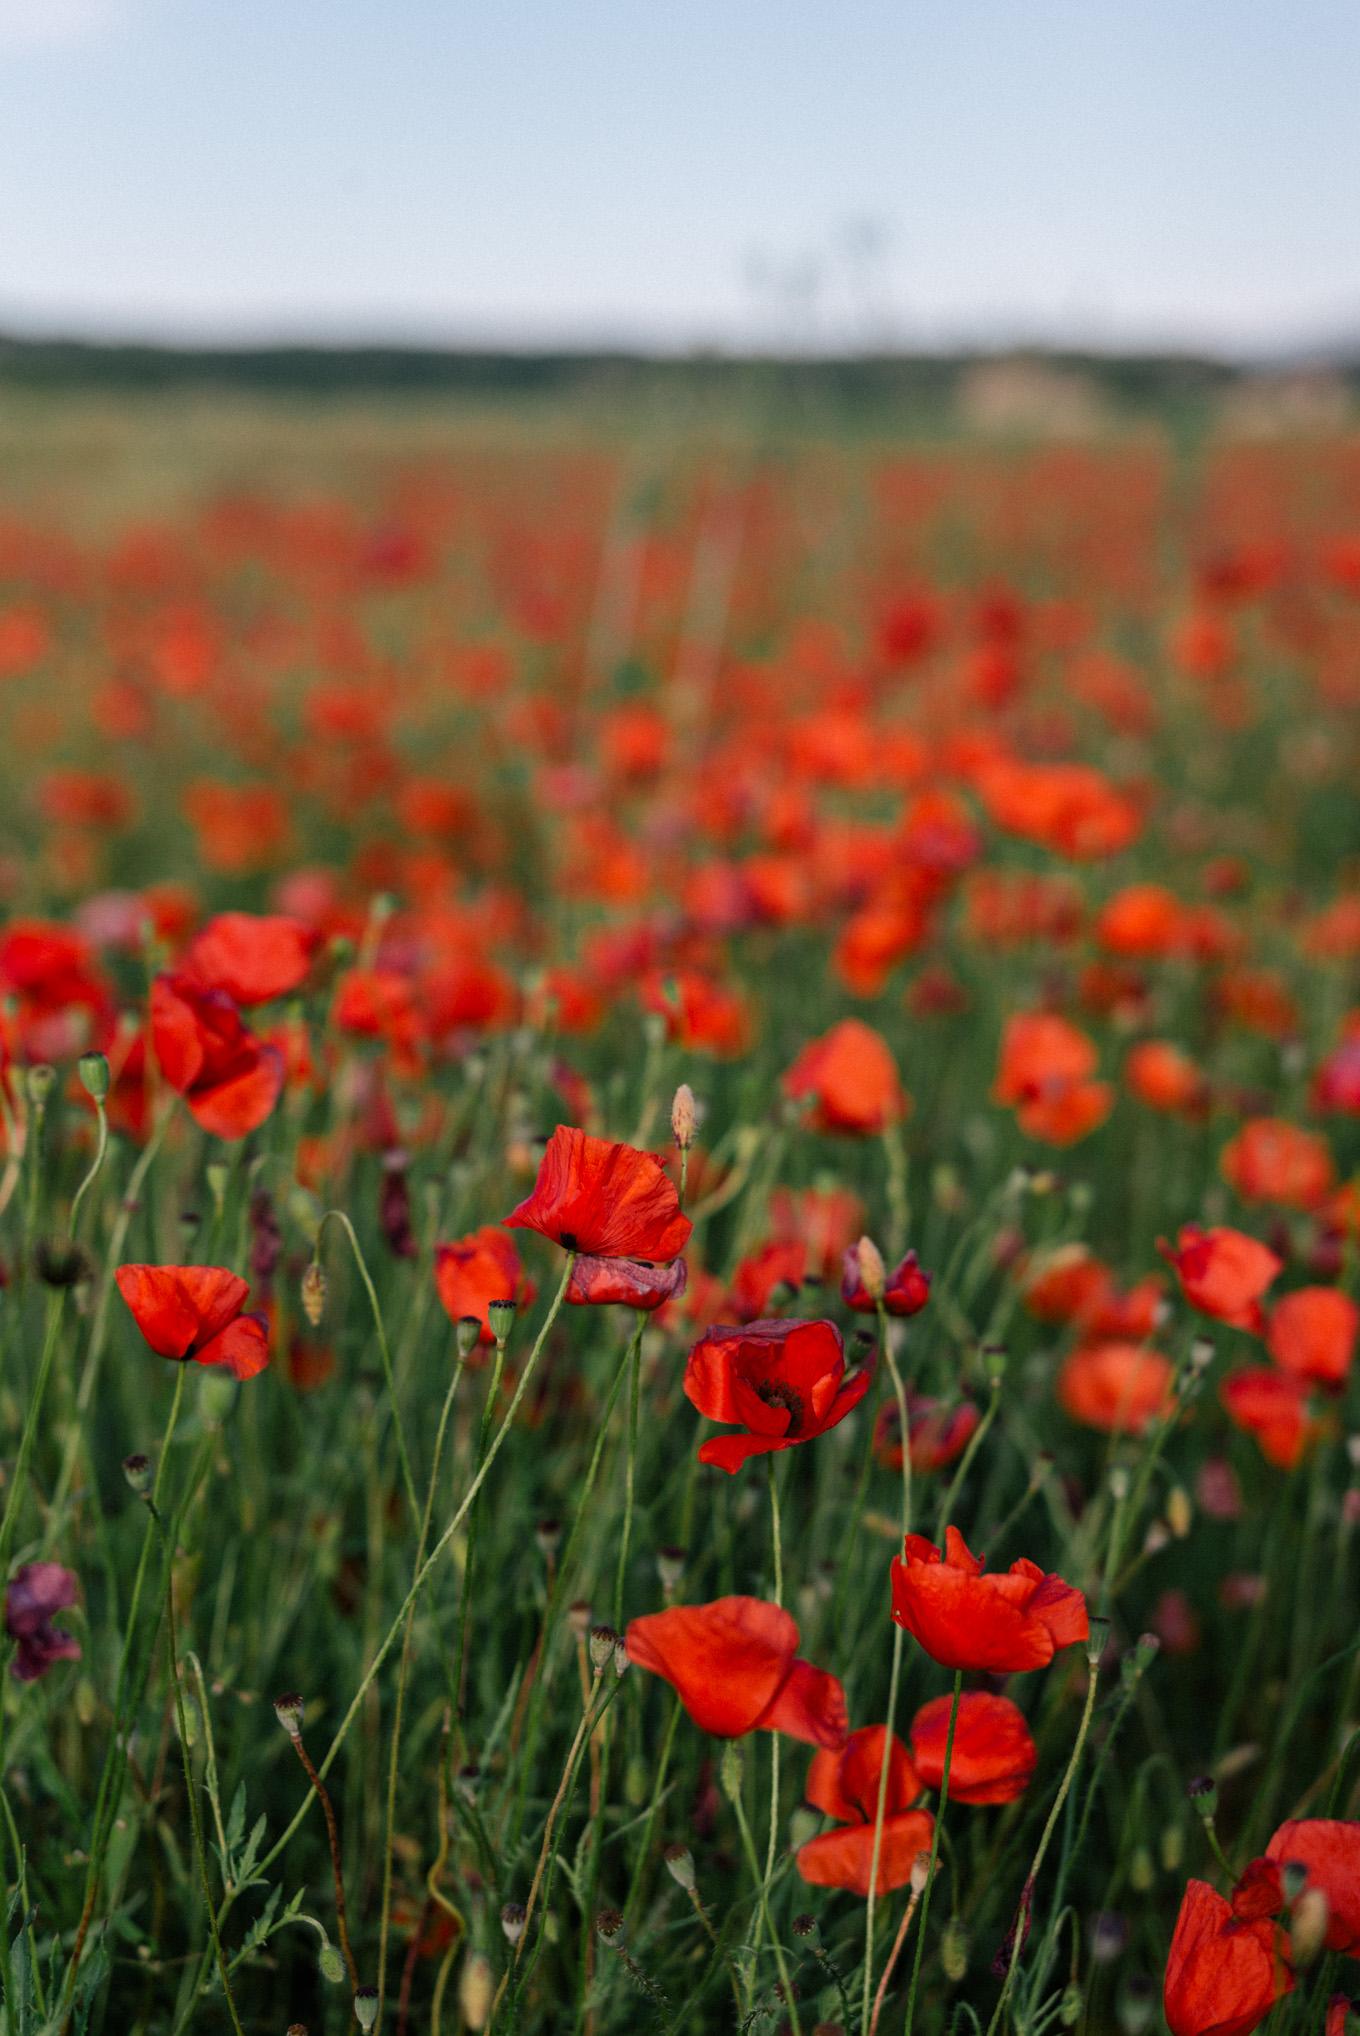 gmg-red-dress-poppy-fields-france-1008844